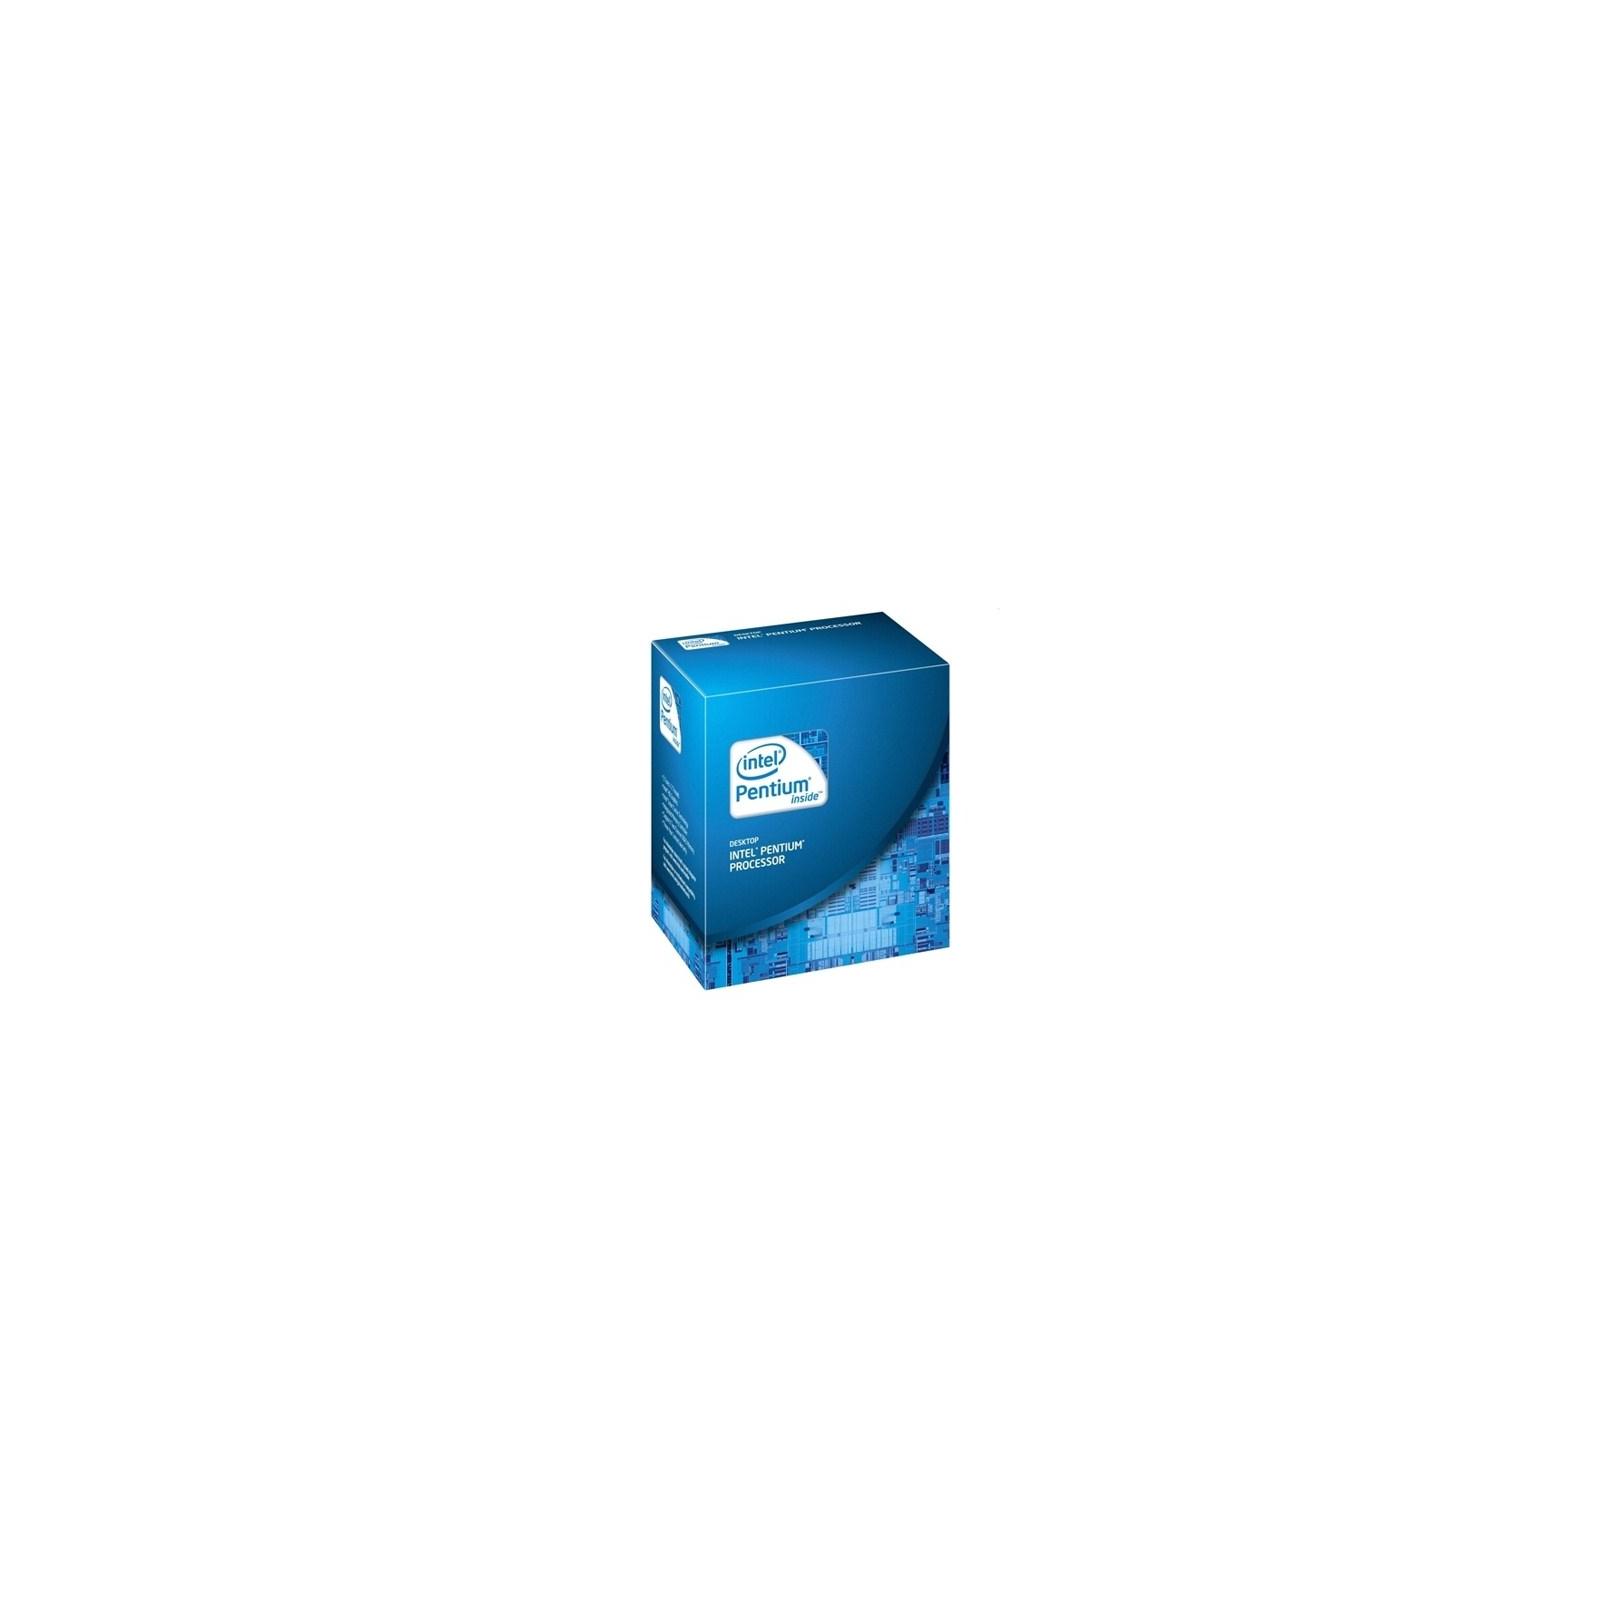 Процессор INTEL Pentium G2030 (BX80637G2030)